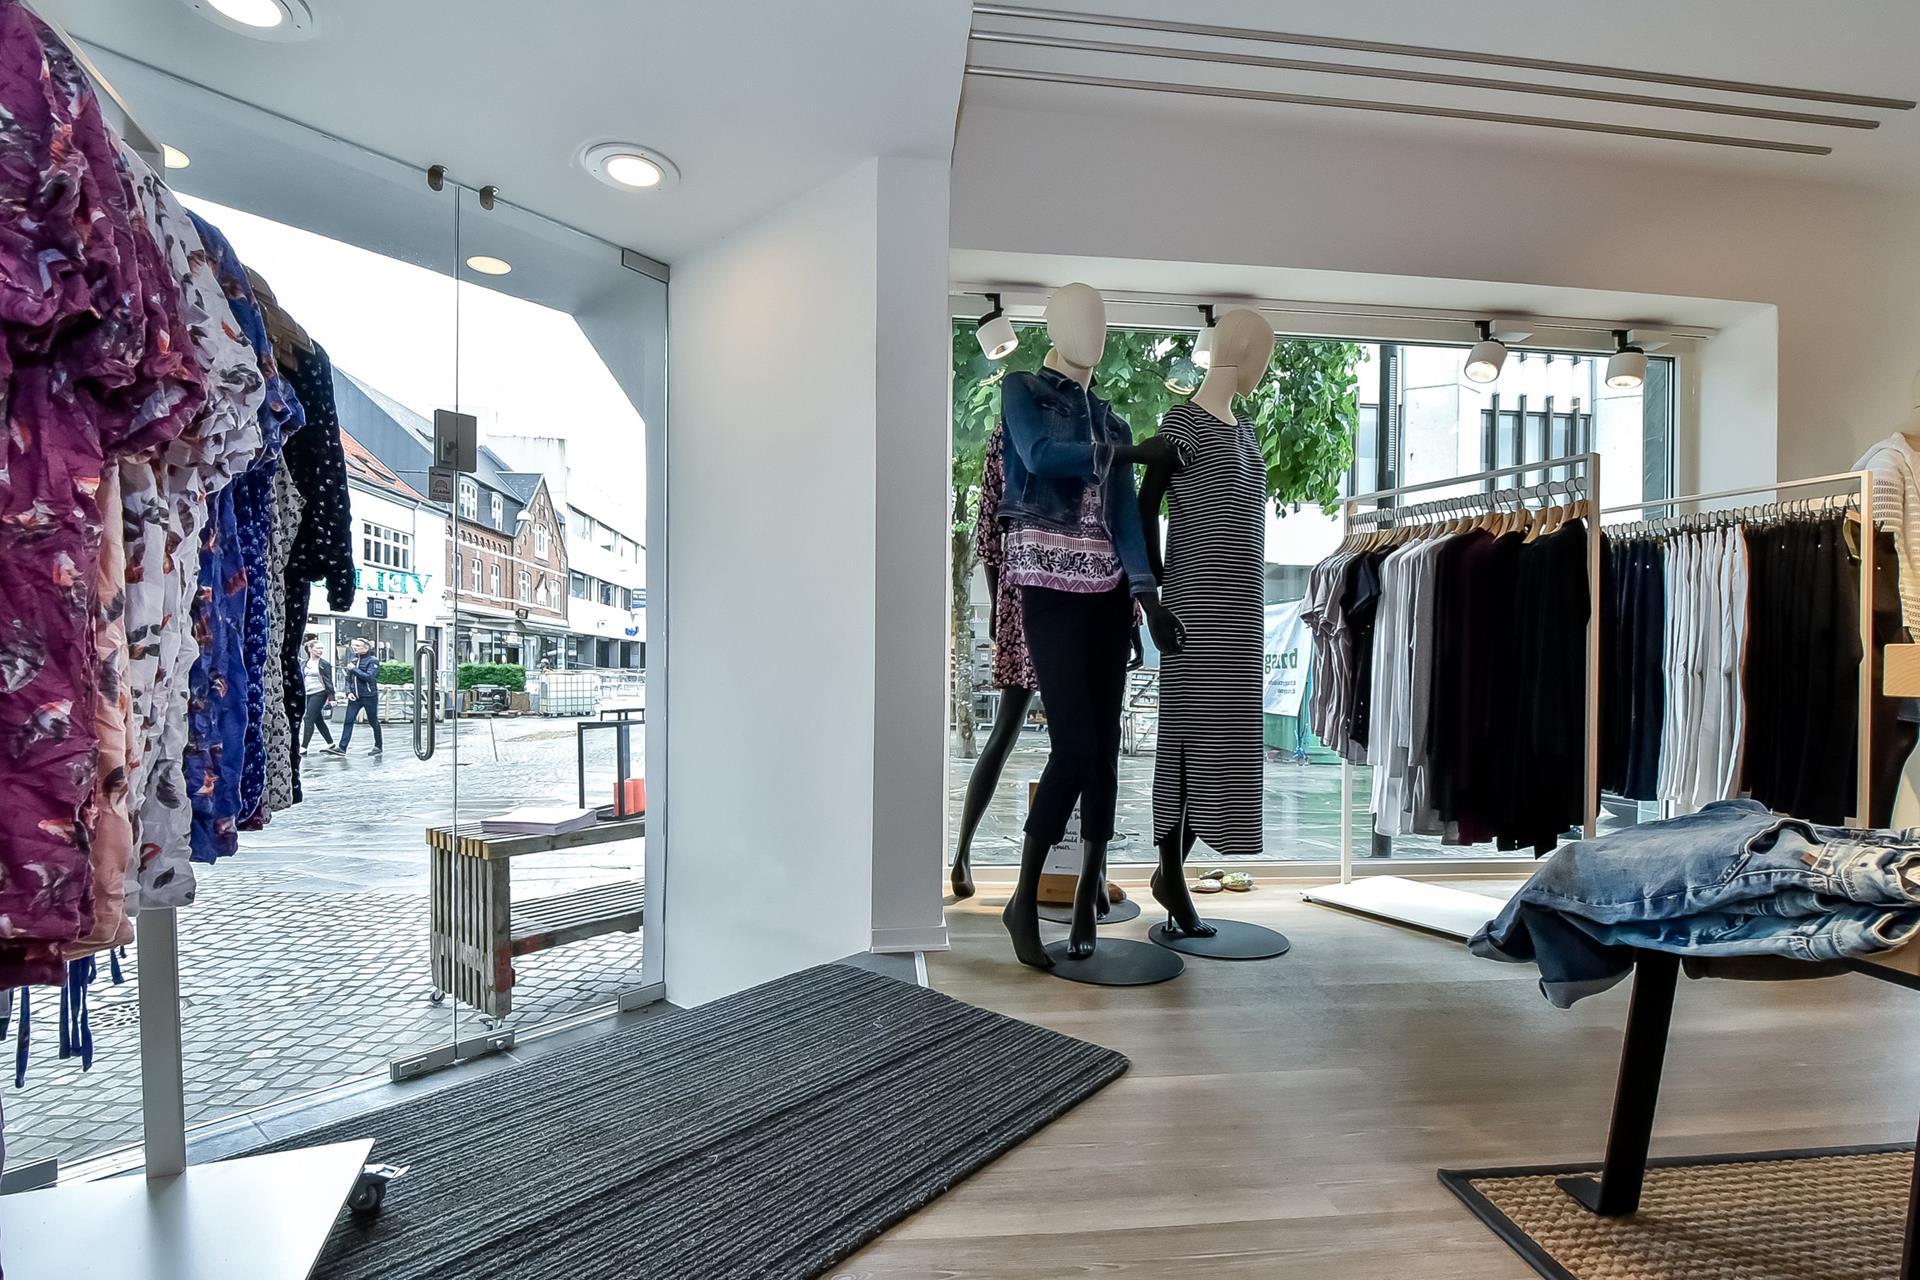 Bolig/erhverv på Bredgade i Herning - Butik